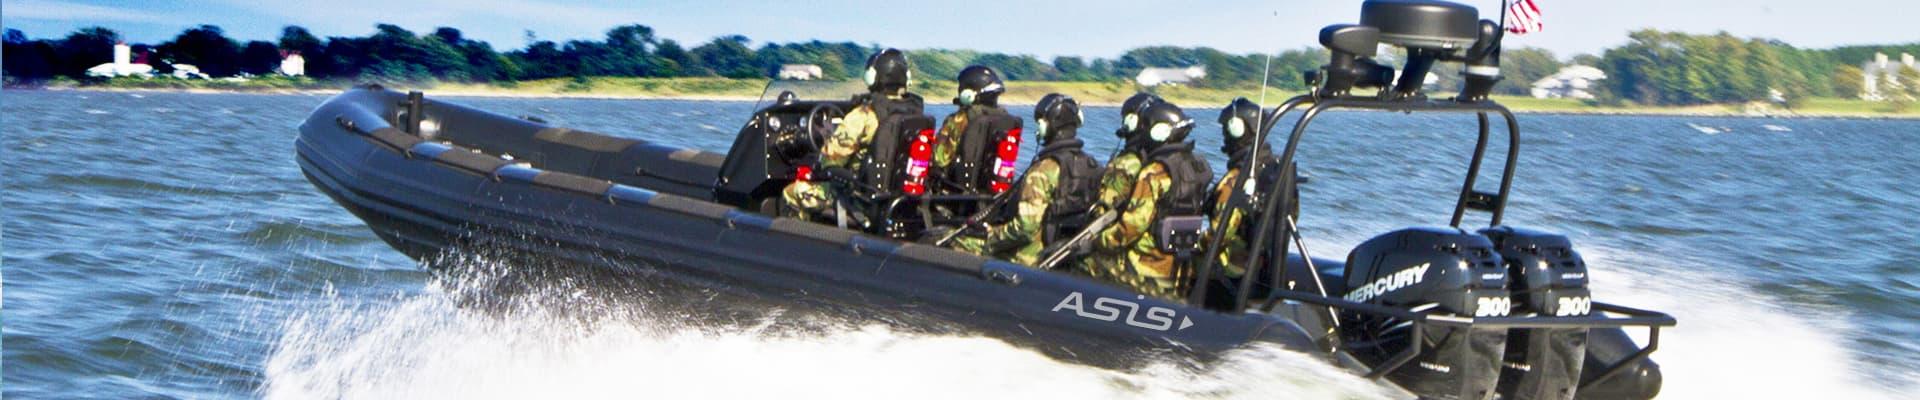 Coast-Guard-Boat-9.5m